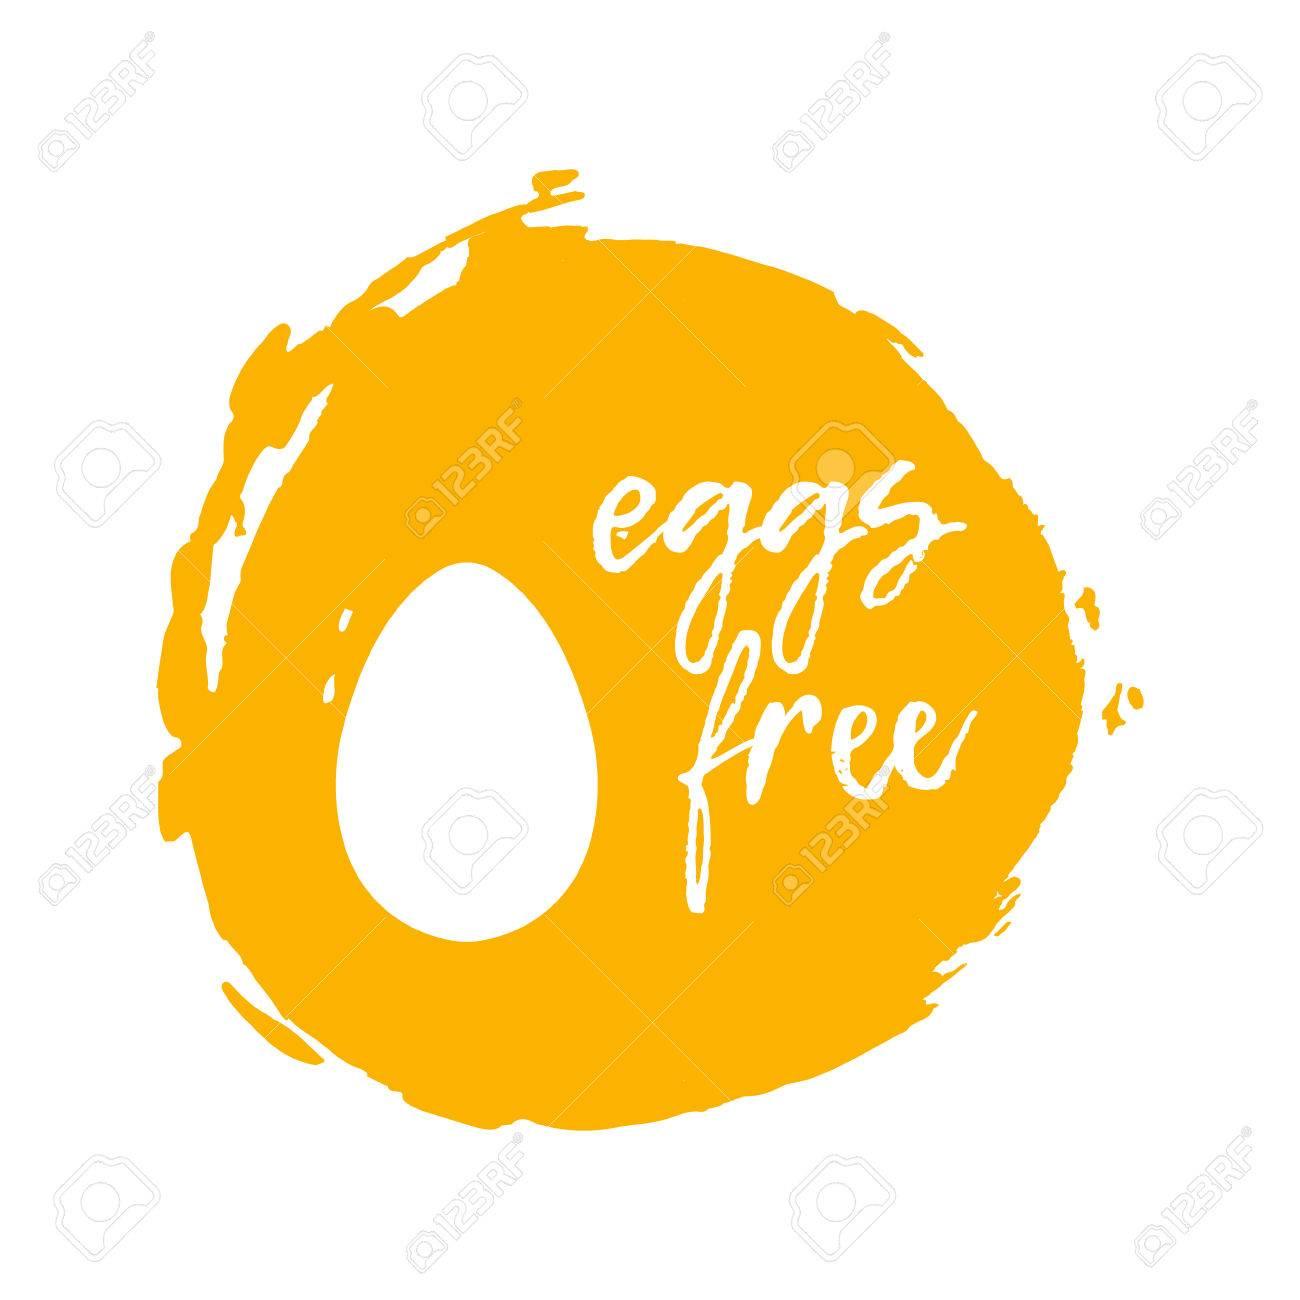 Egg free icon food intolerance symbols vector illustration egg free icon food intolerance symbols vector illustration stock vector 77785786 biocorpaavc Images